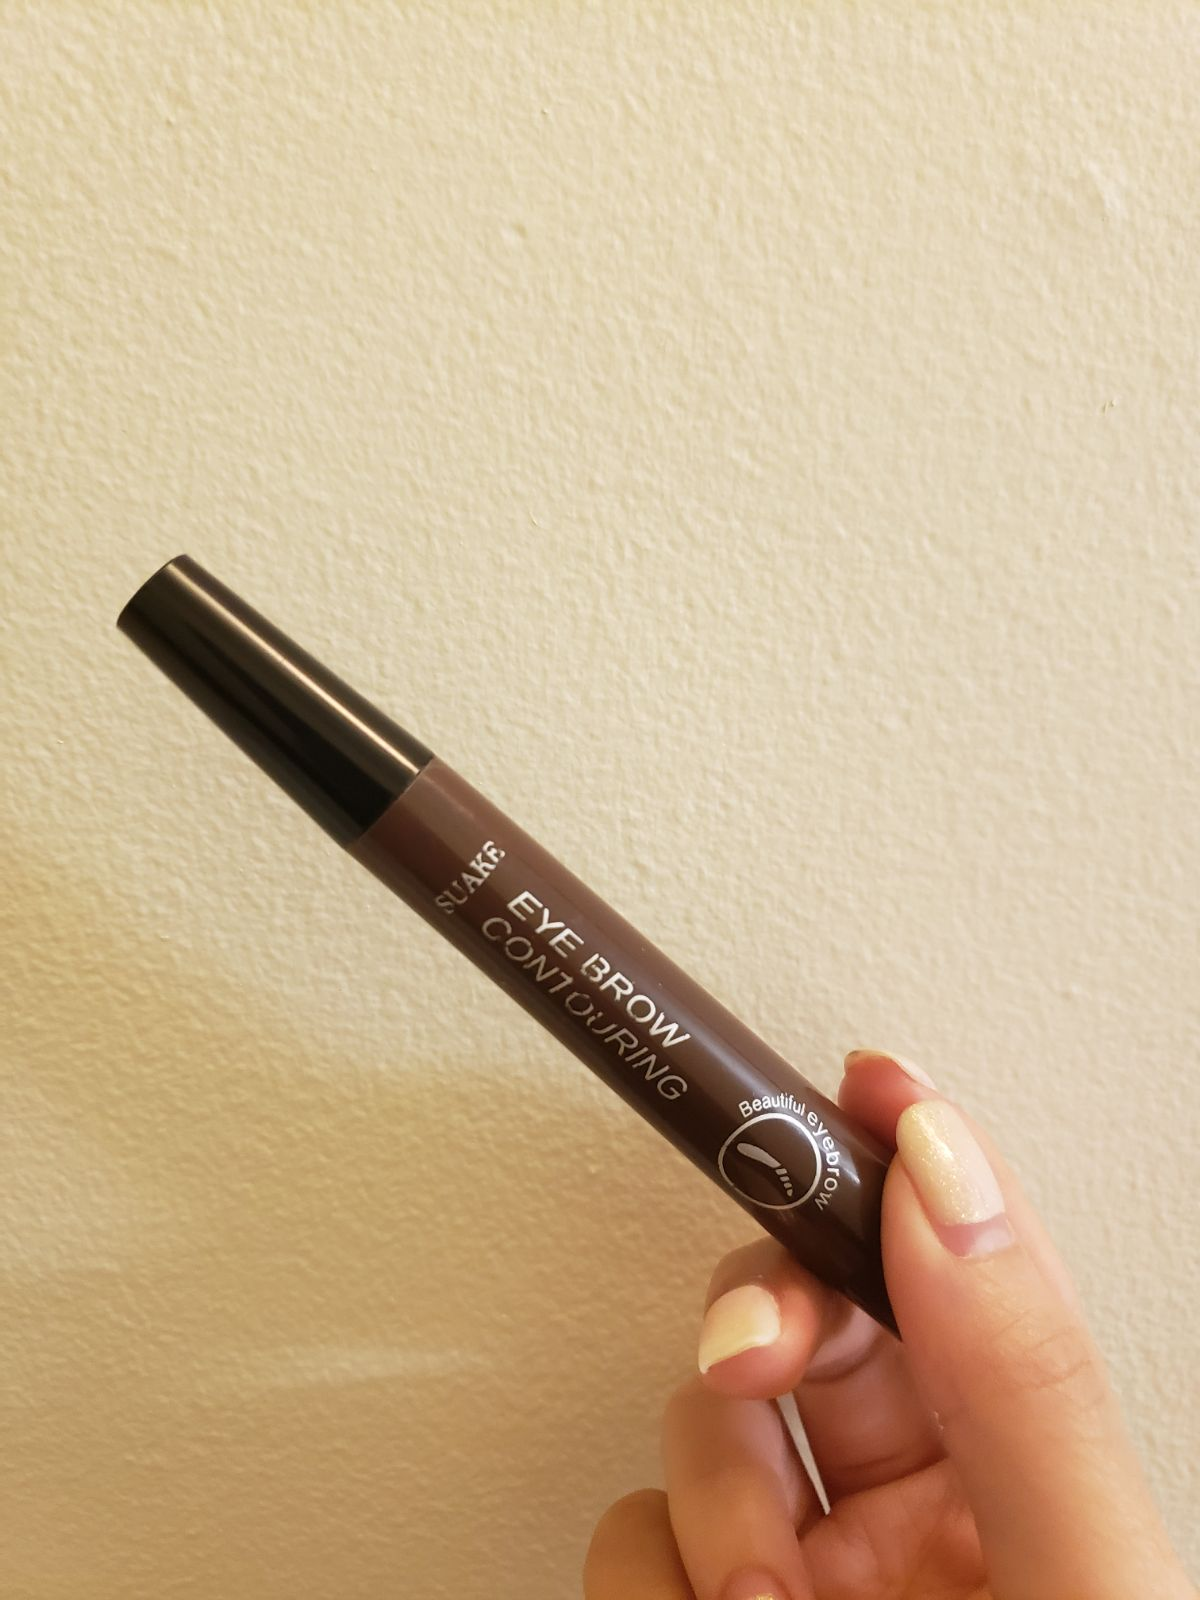 New Eyebrow Tattoo Pen (Dark Brown)